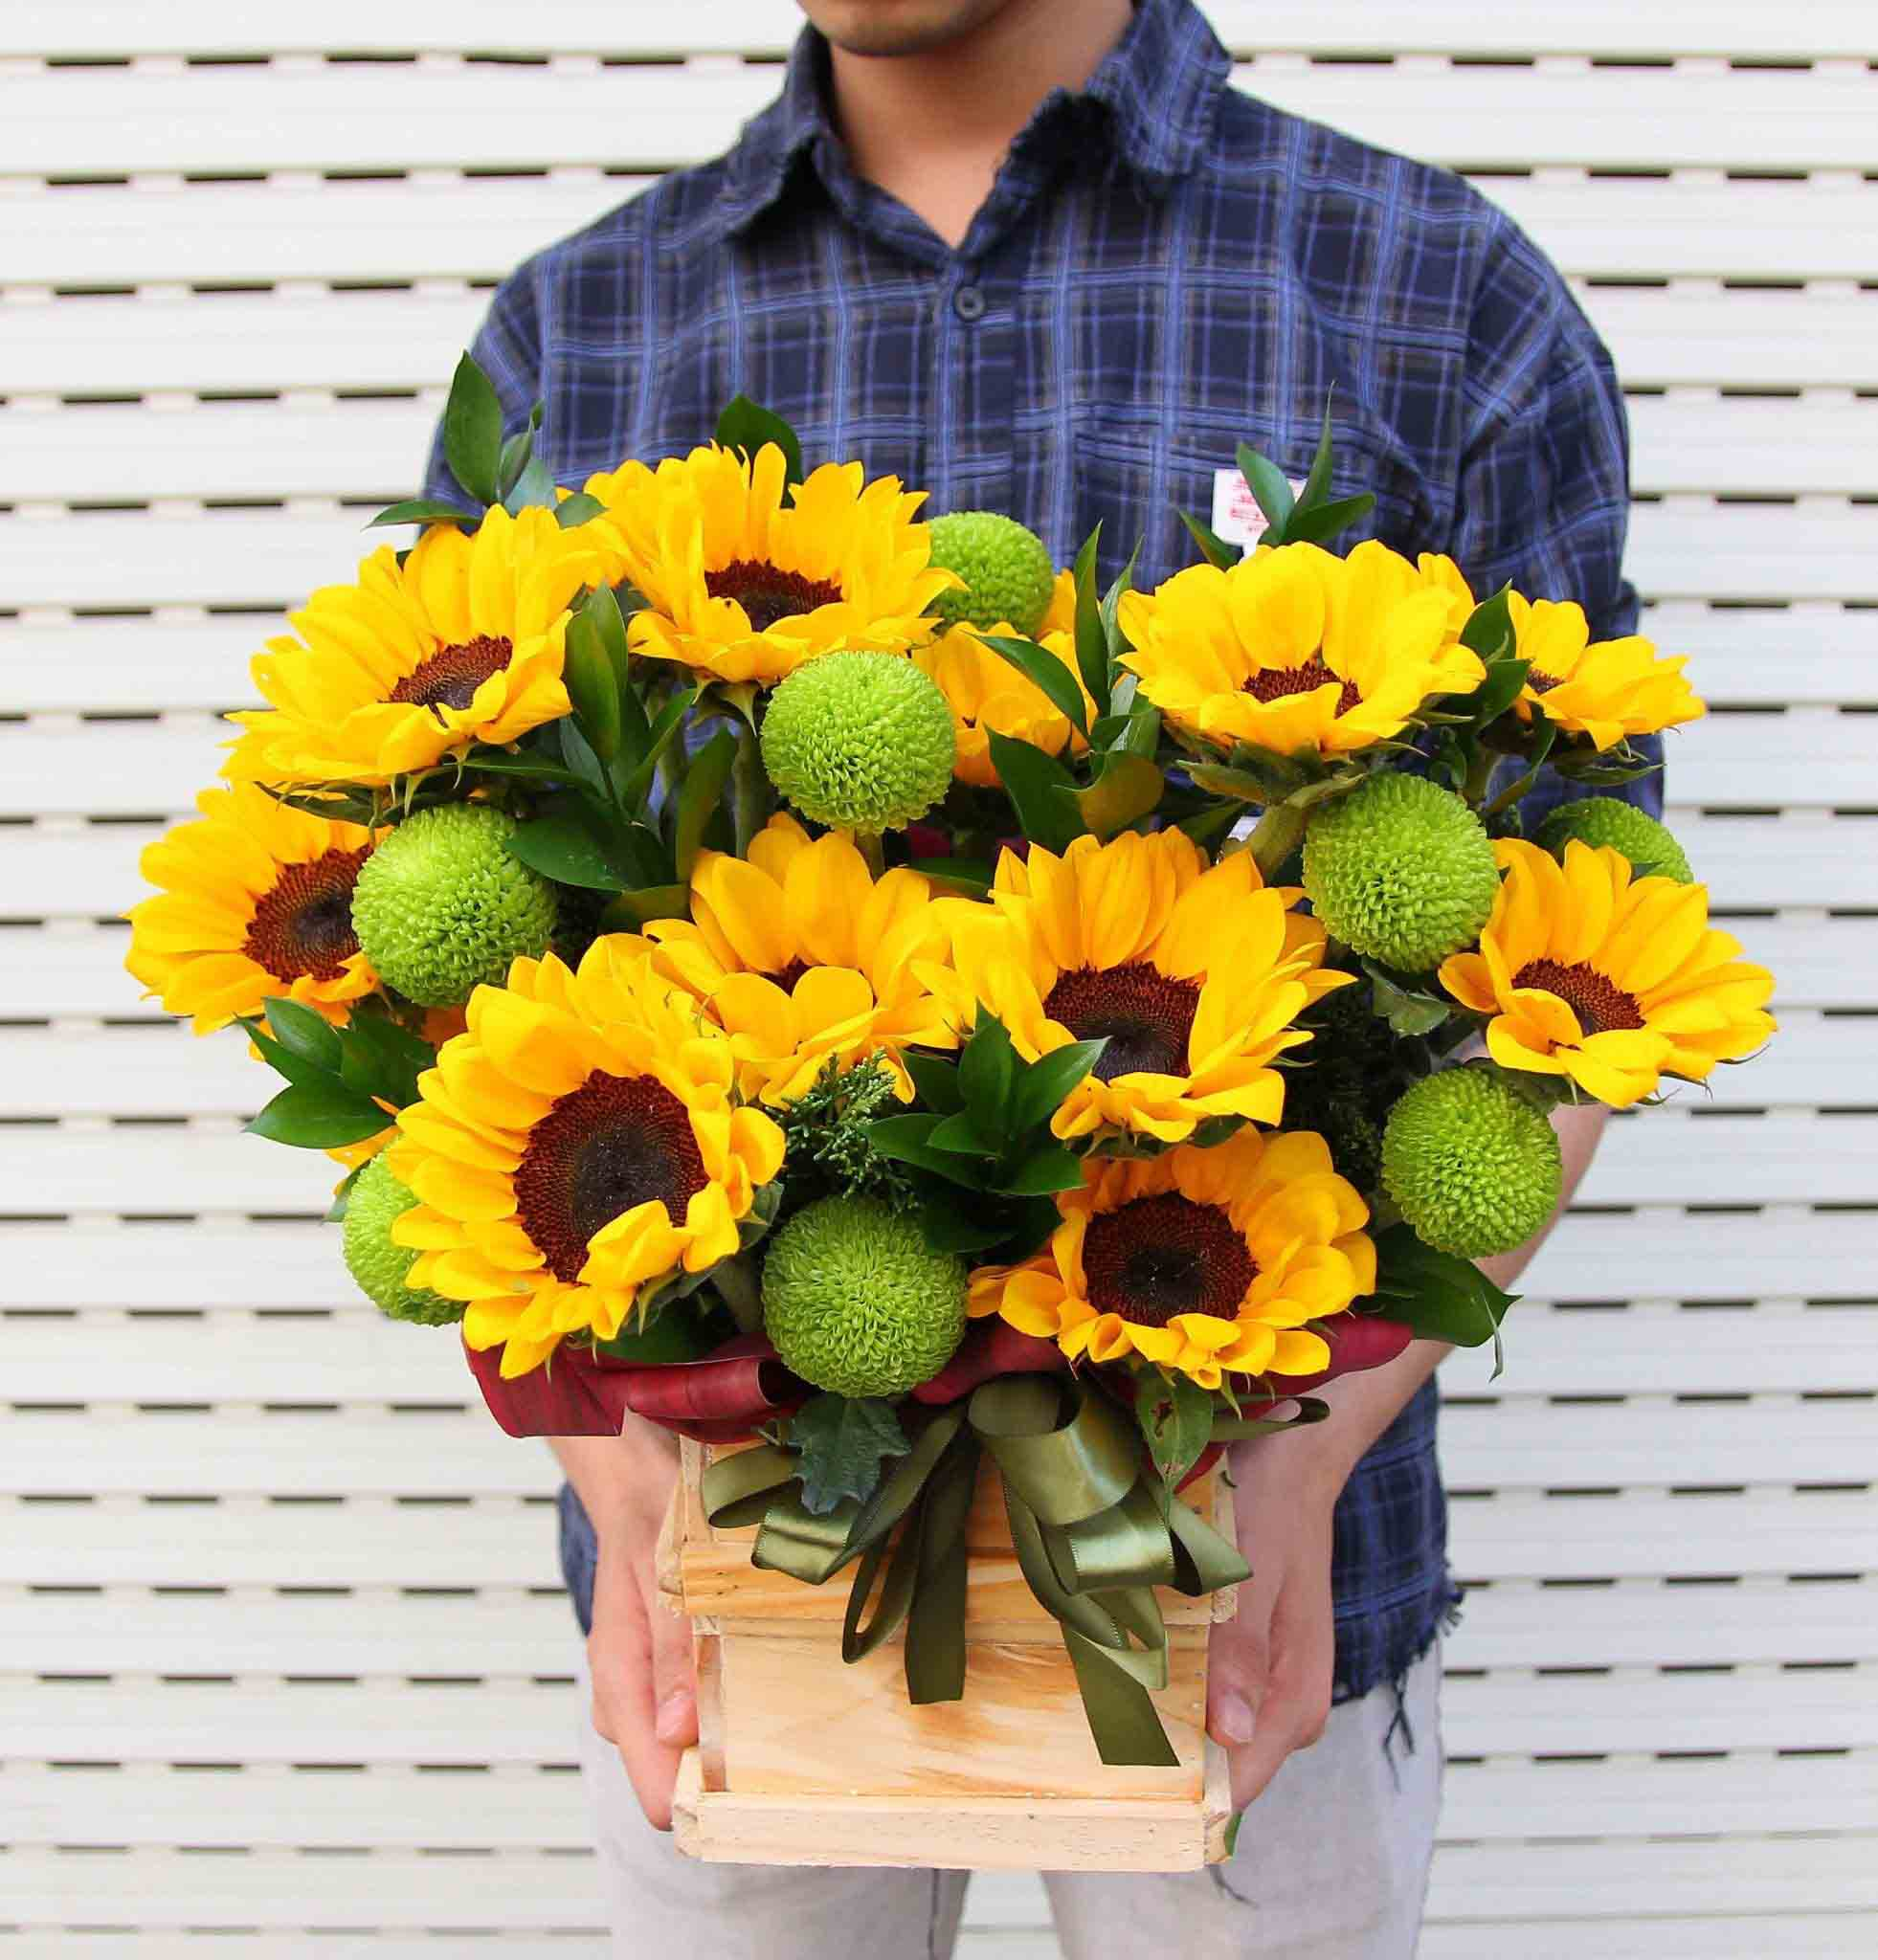 Các kiểu cắm hoa Hướng dương đẹp